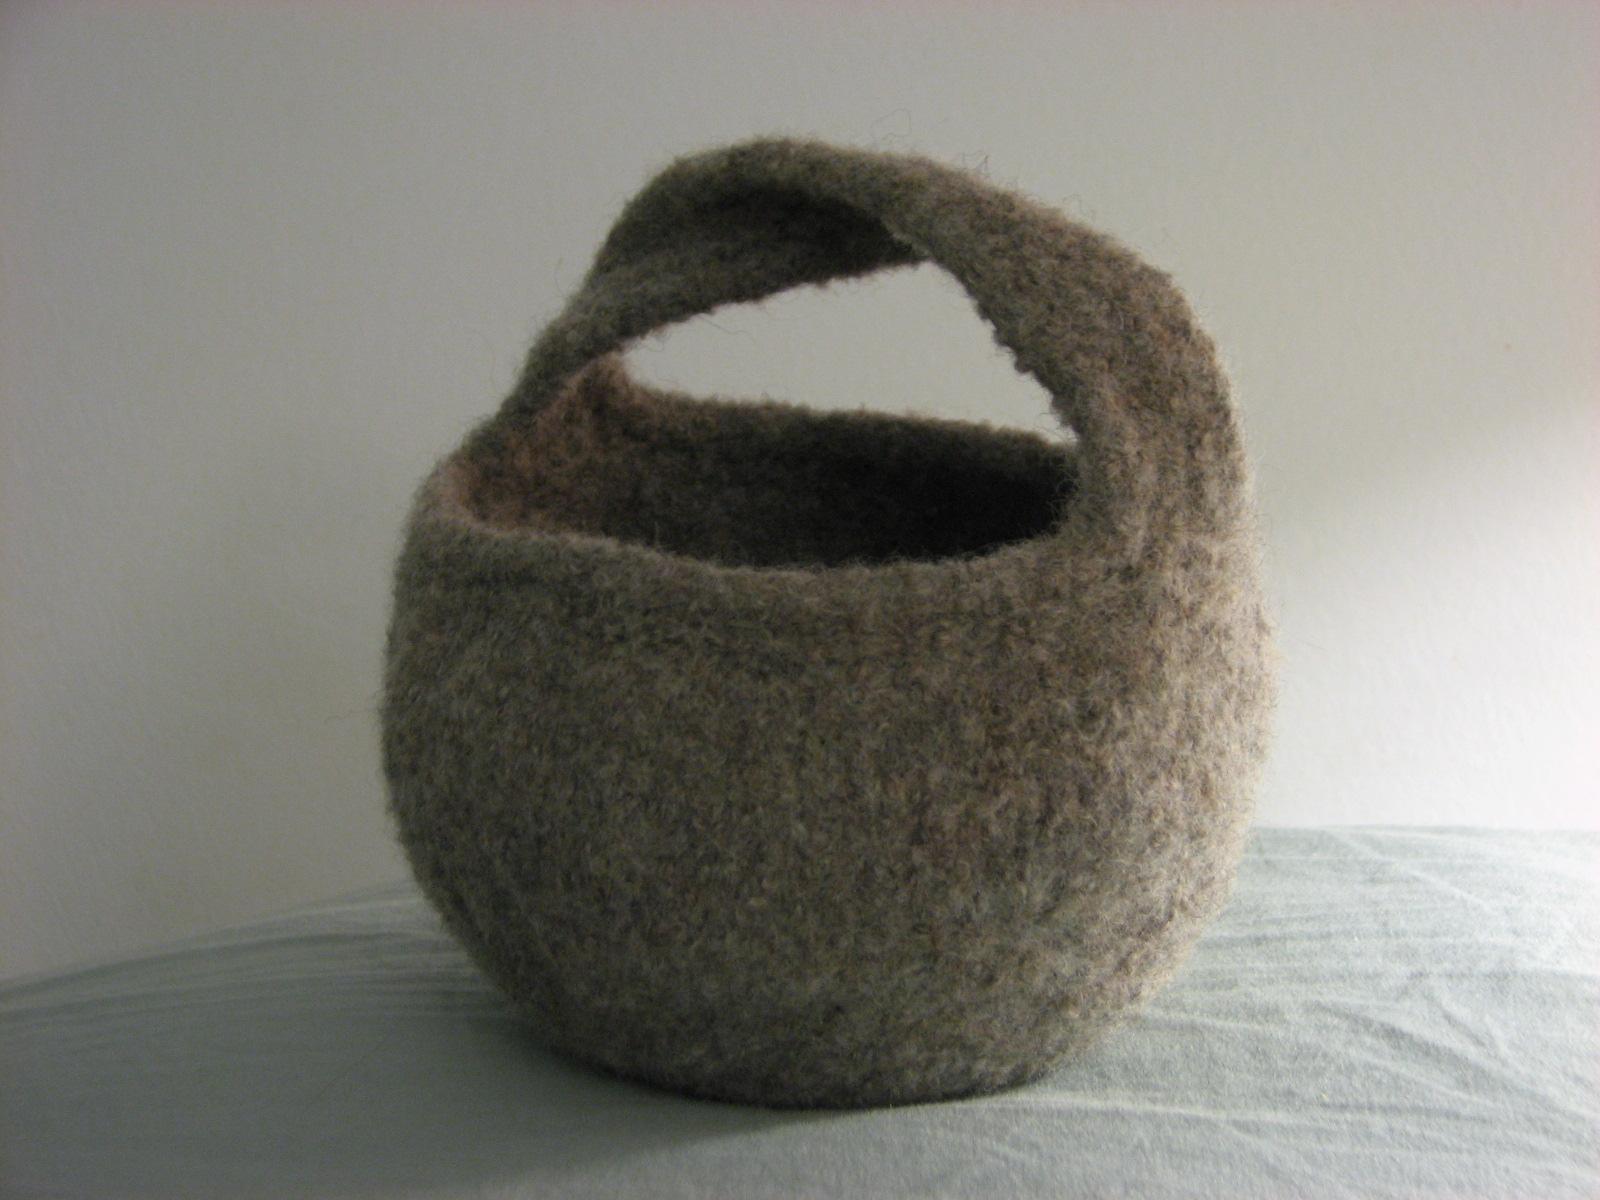 Adventures in the Boring: The Möbius Basket of Rage